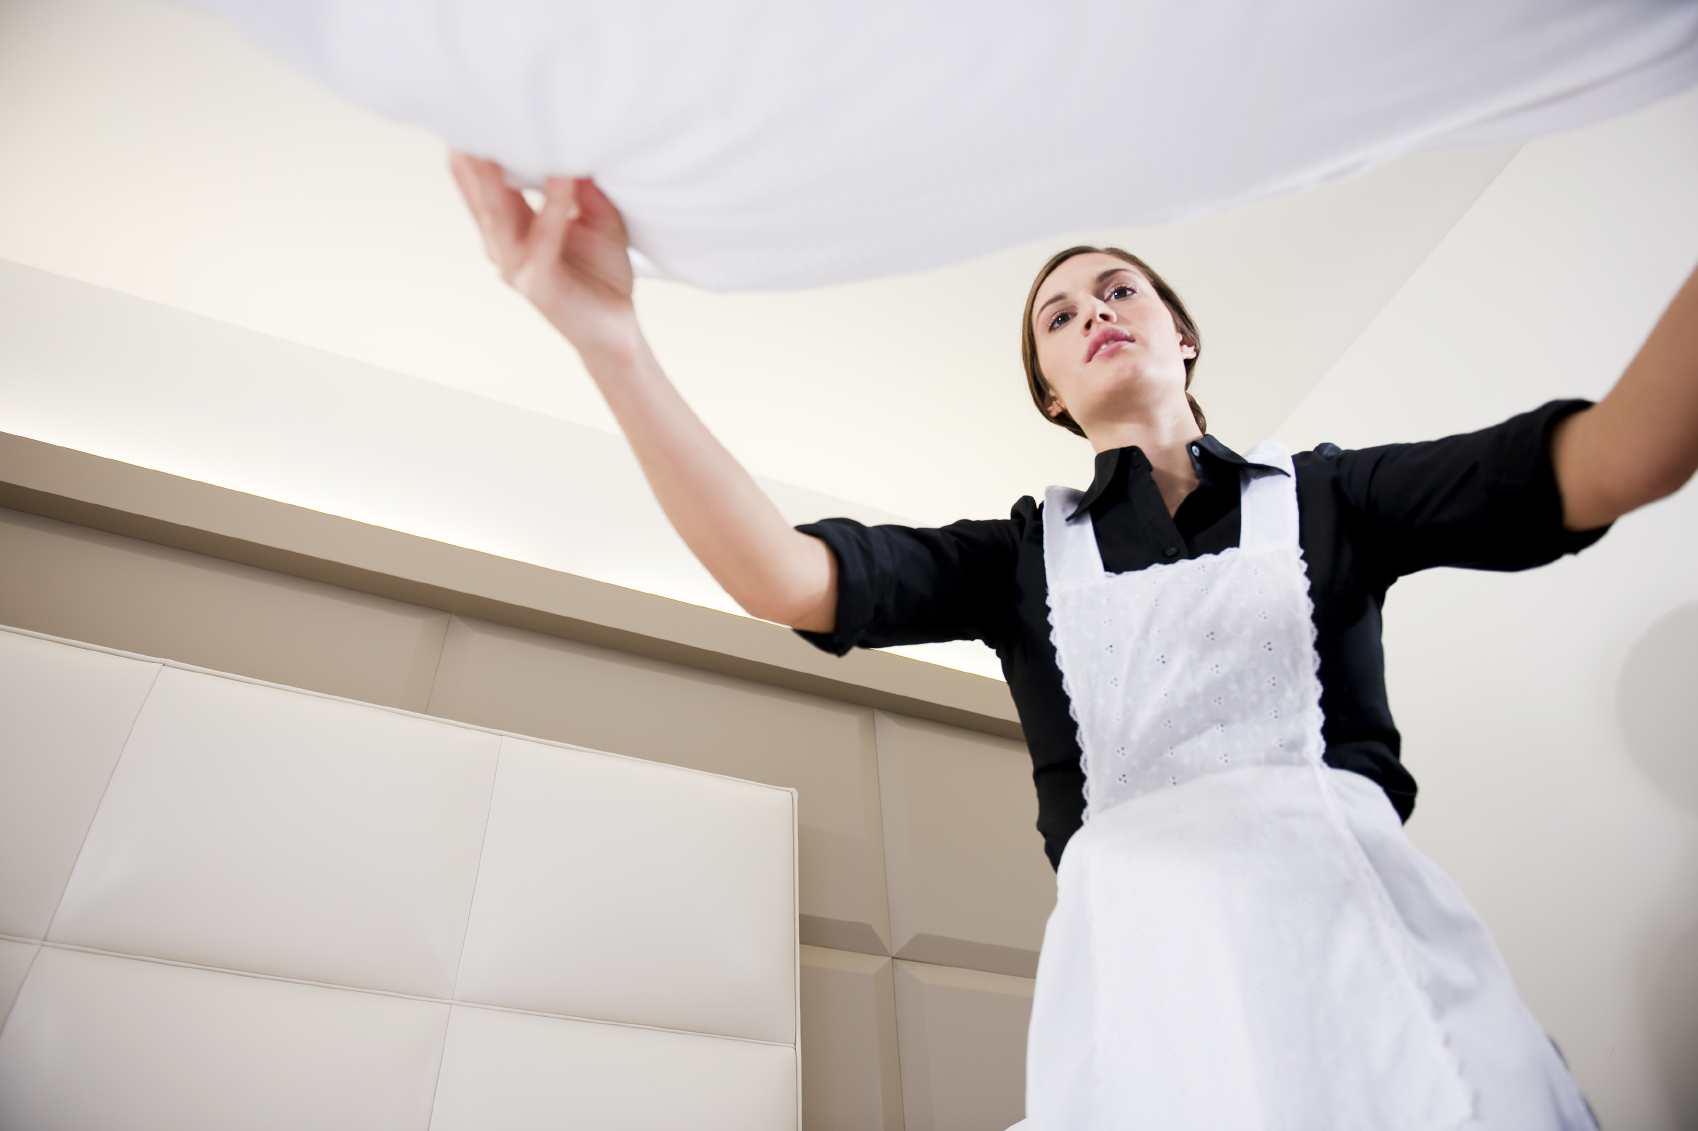 Maids Housekeeper New York Ny United States